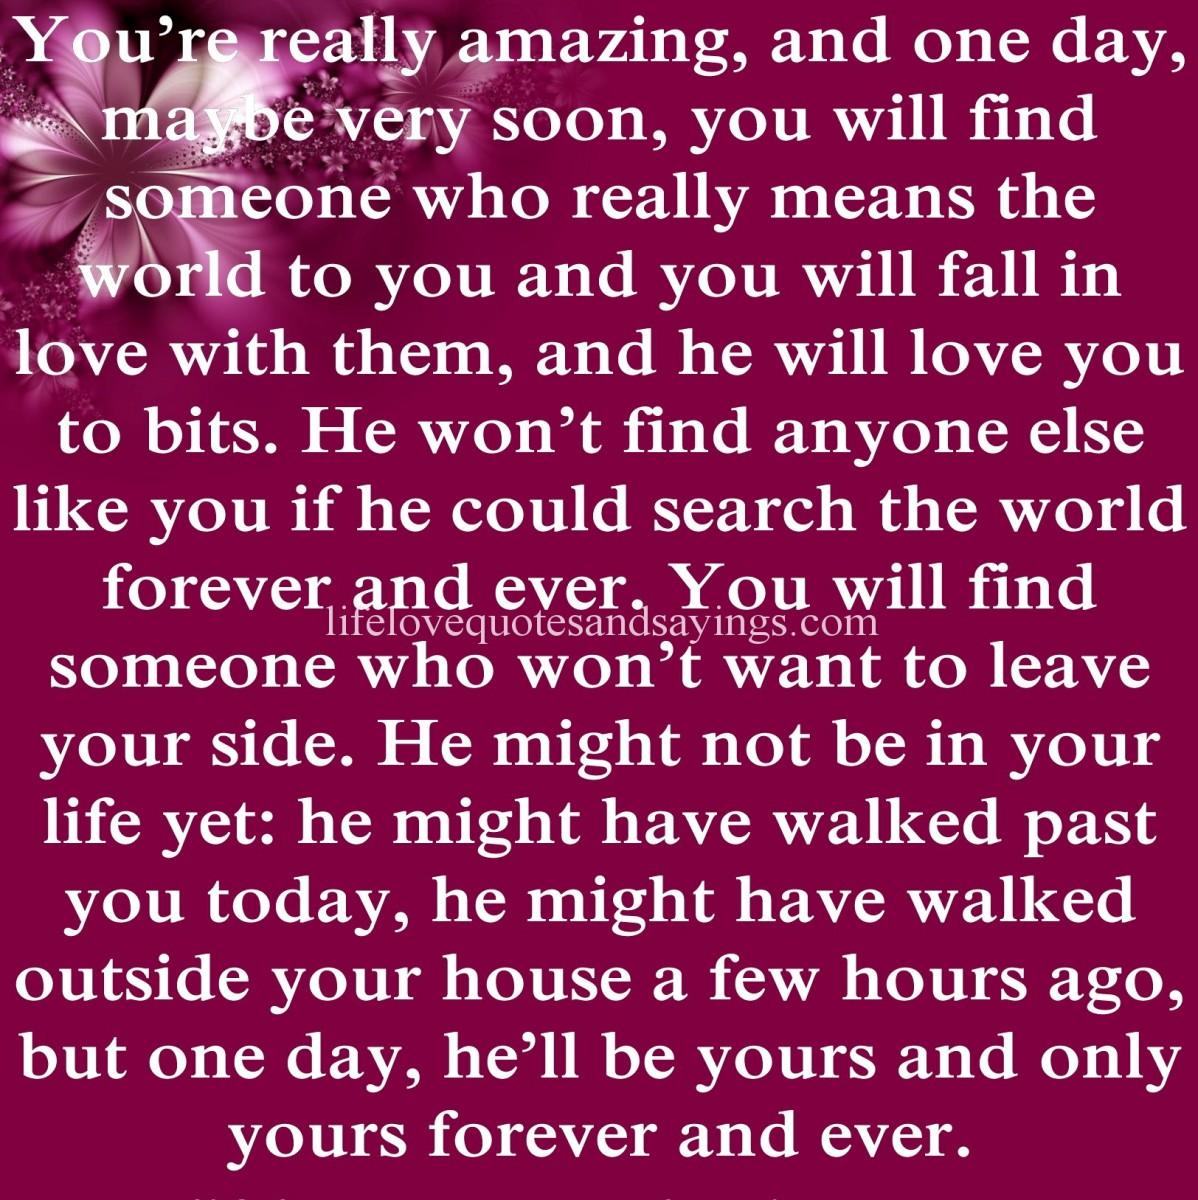 Loving Someone Picture Quotes: Truly Loving Someone Quotes. QuotesGram